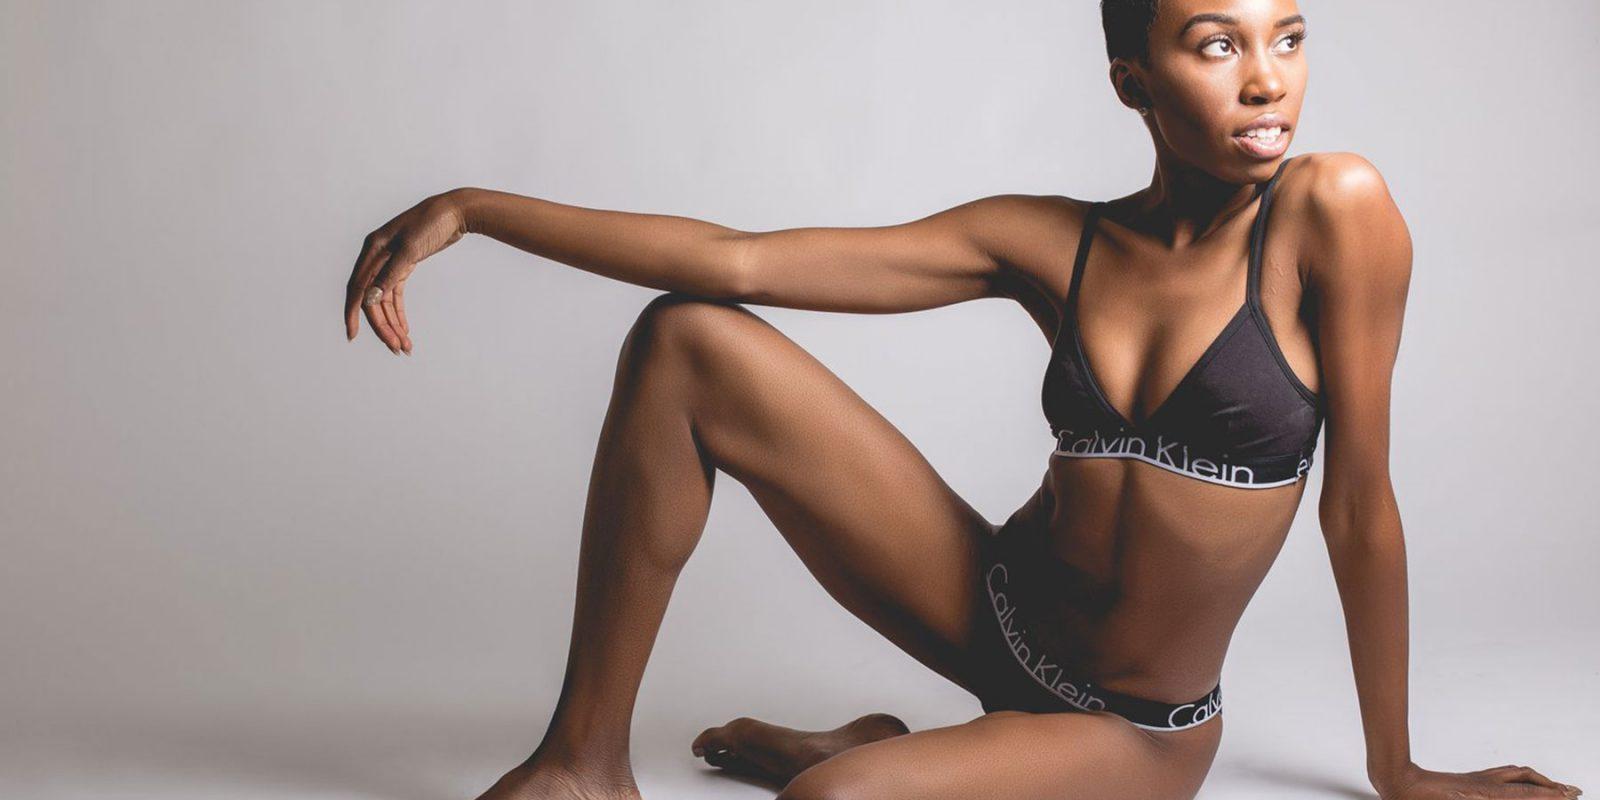 Actress Carrie Bernans in Calvin Klein underwear